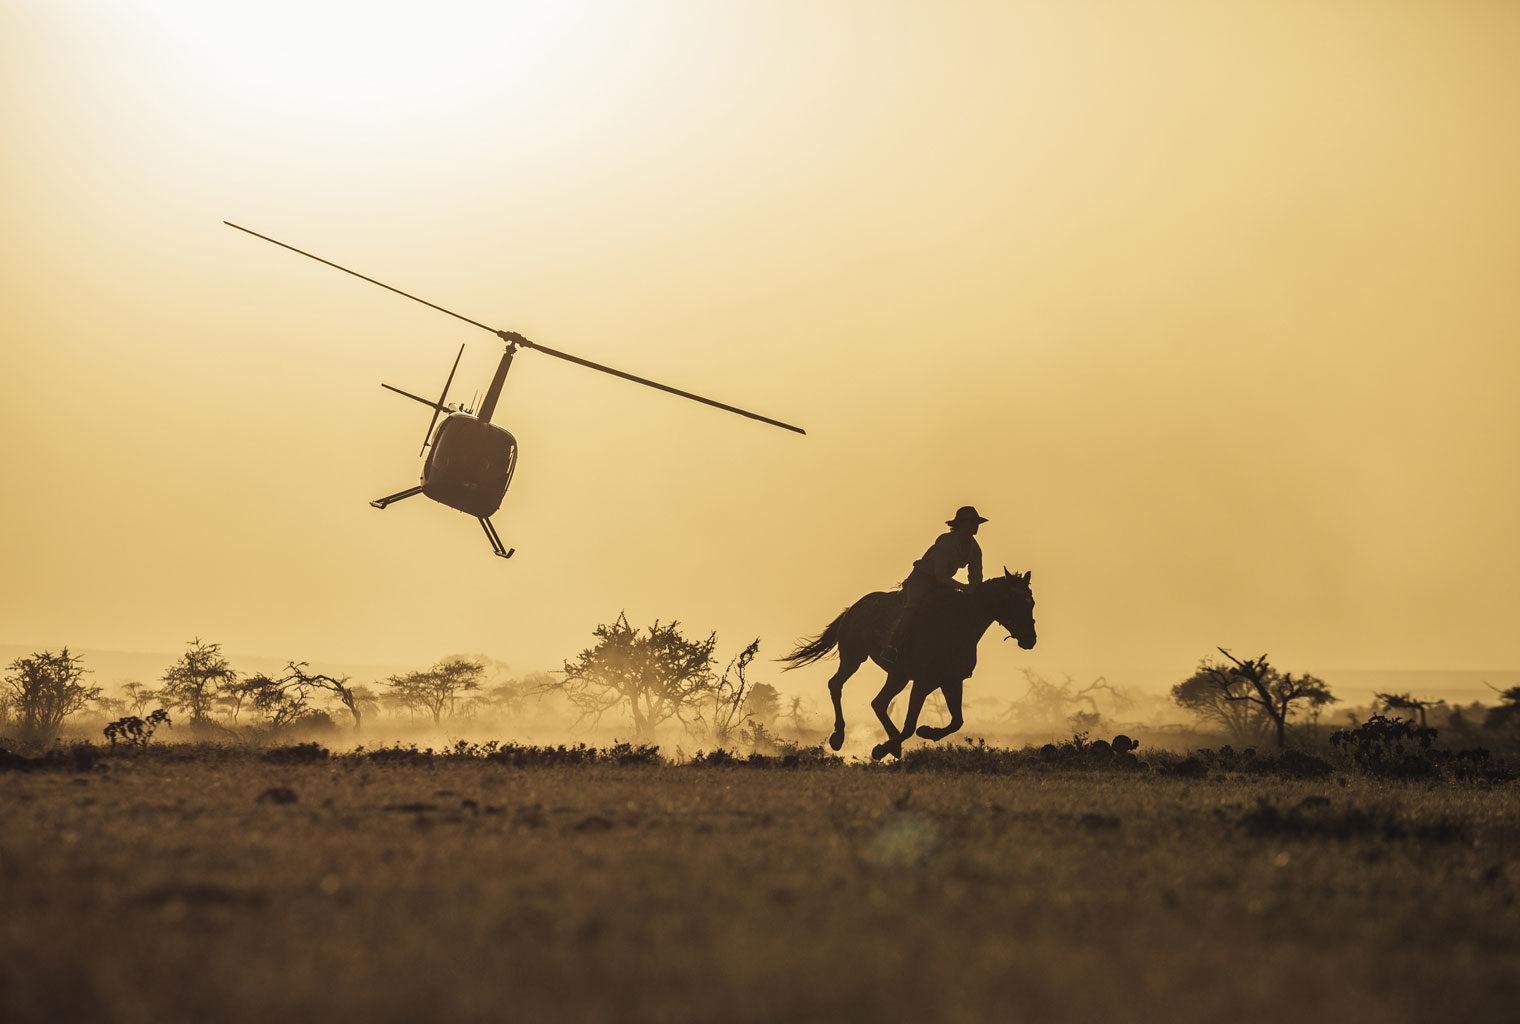 Kenya Laikipia Ol Malo Helicopter Riding